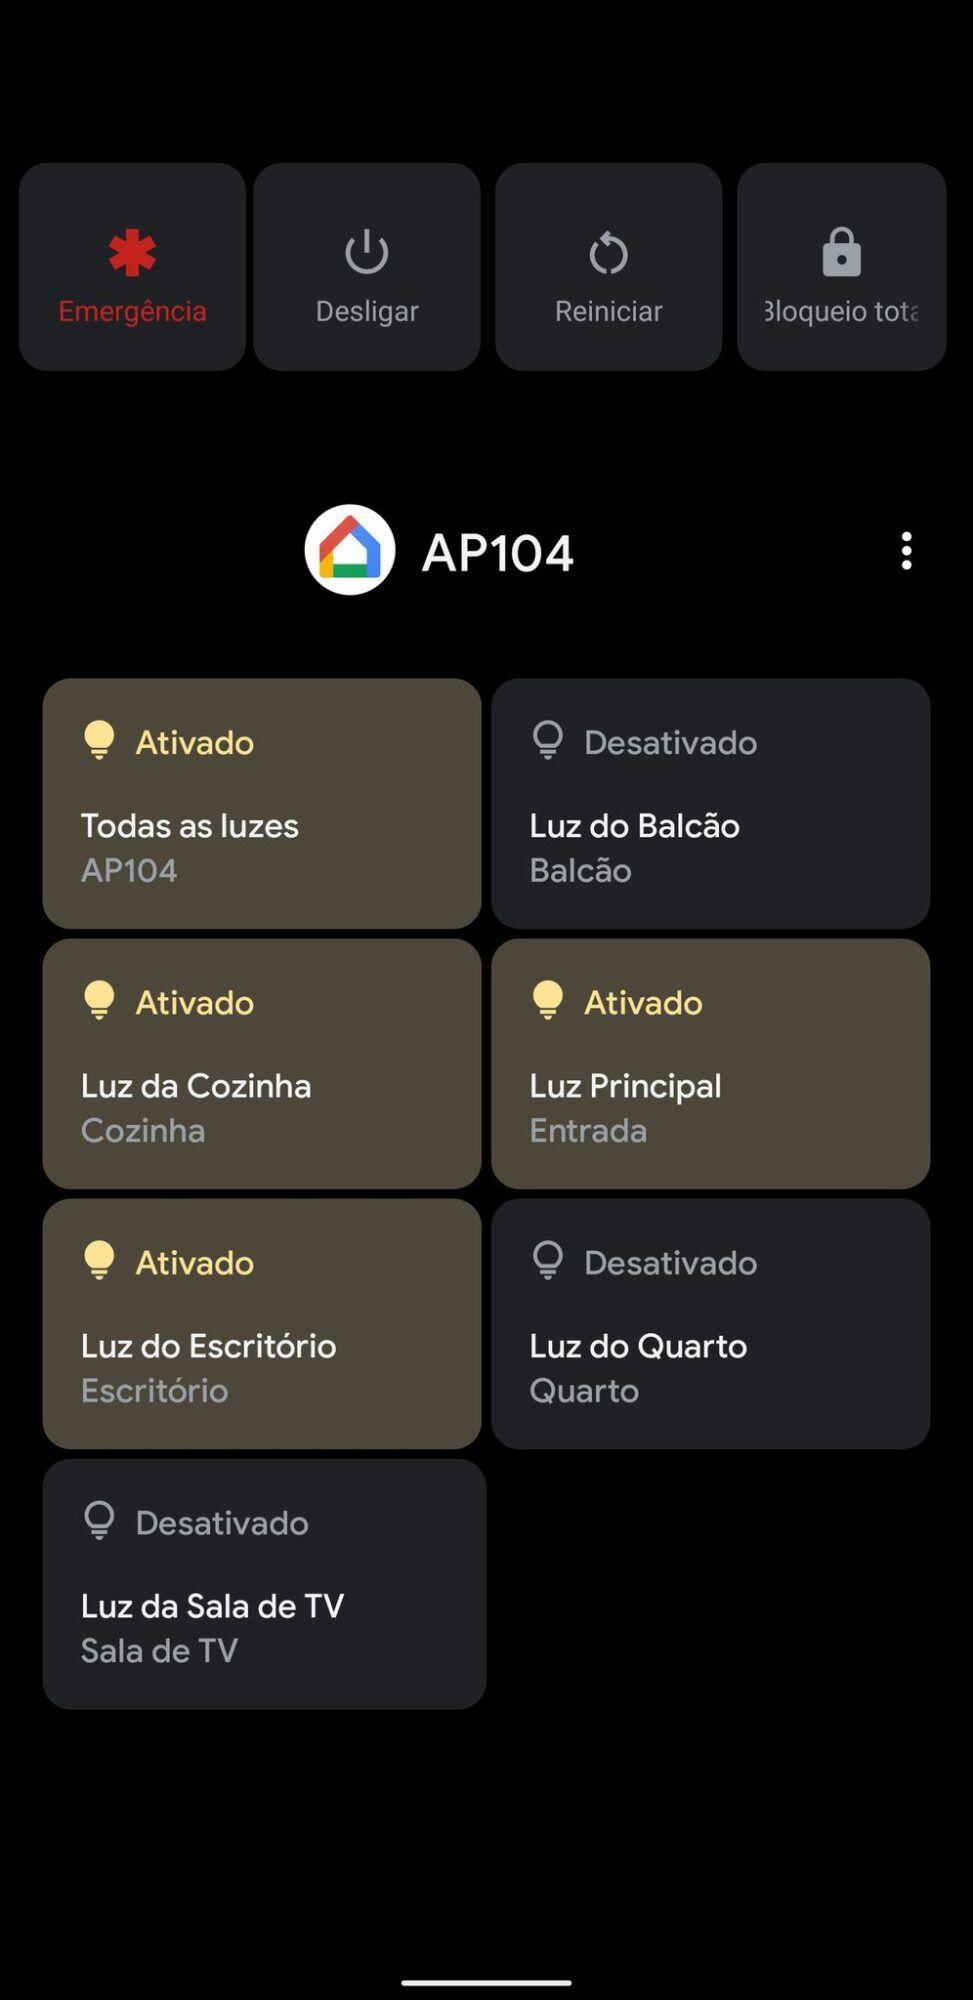 android-11-power-menu-2-1